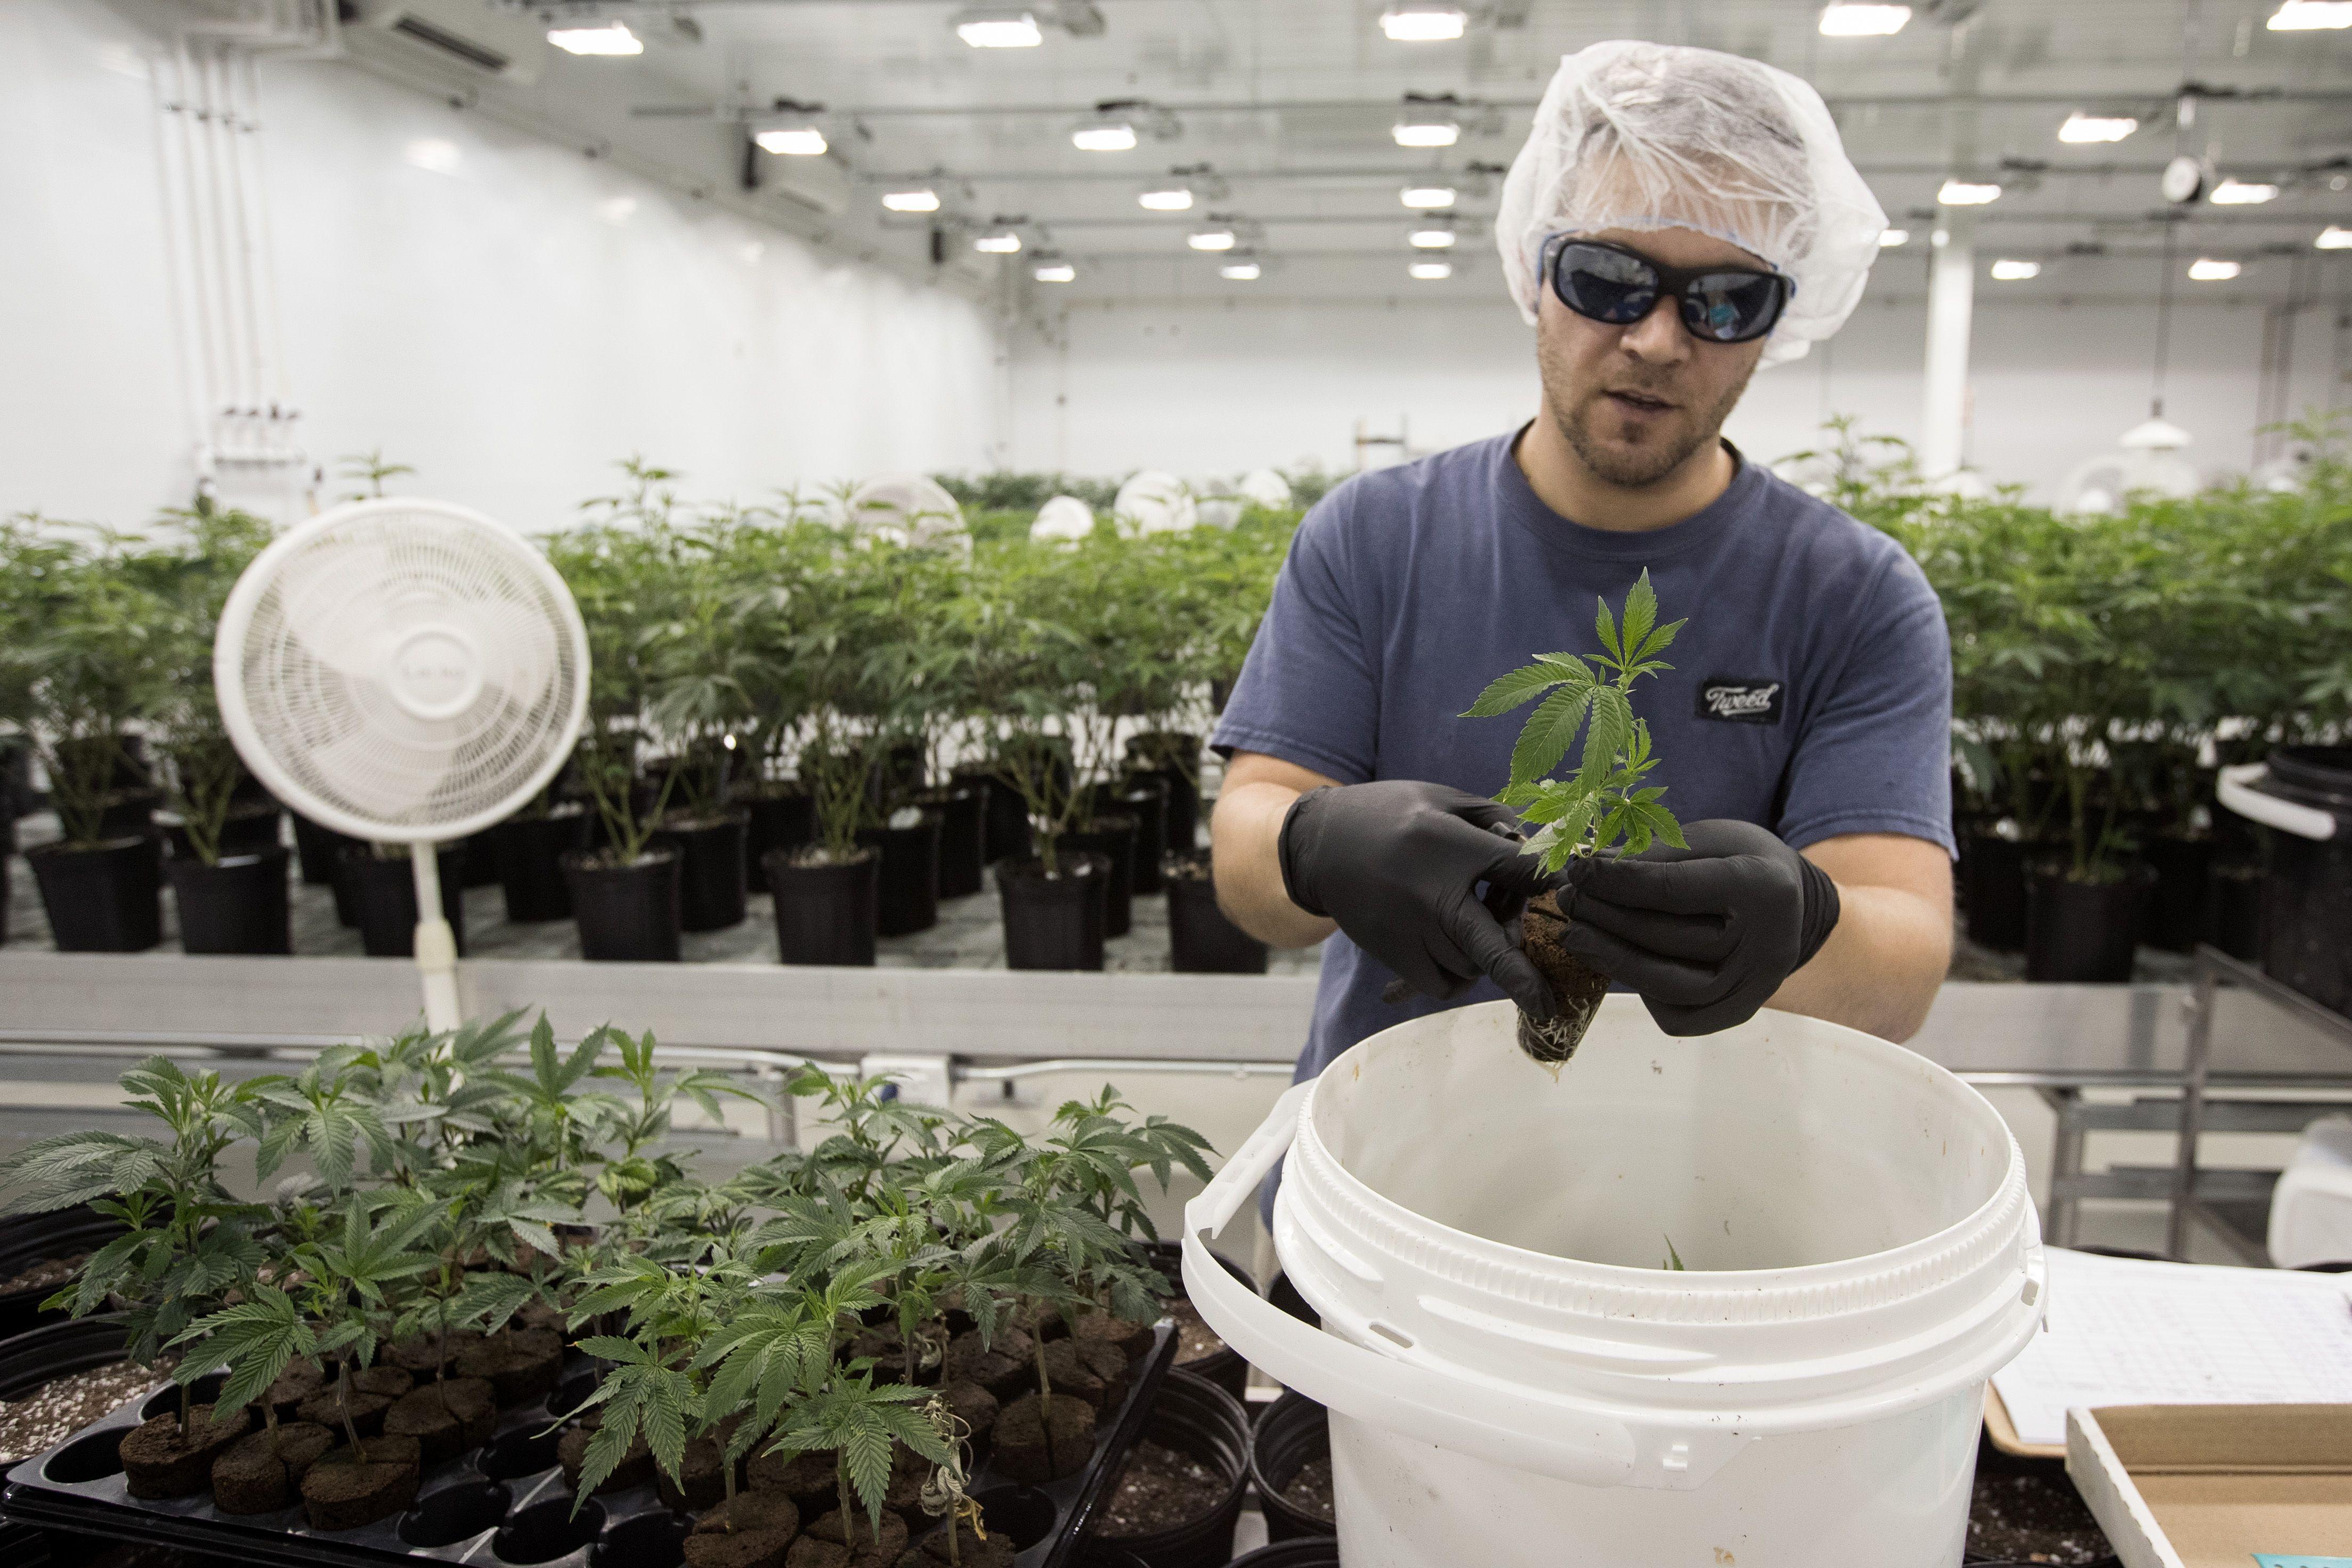 A man works with marijuana.